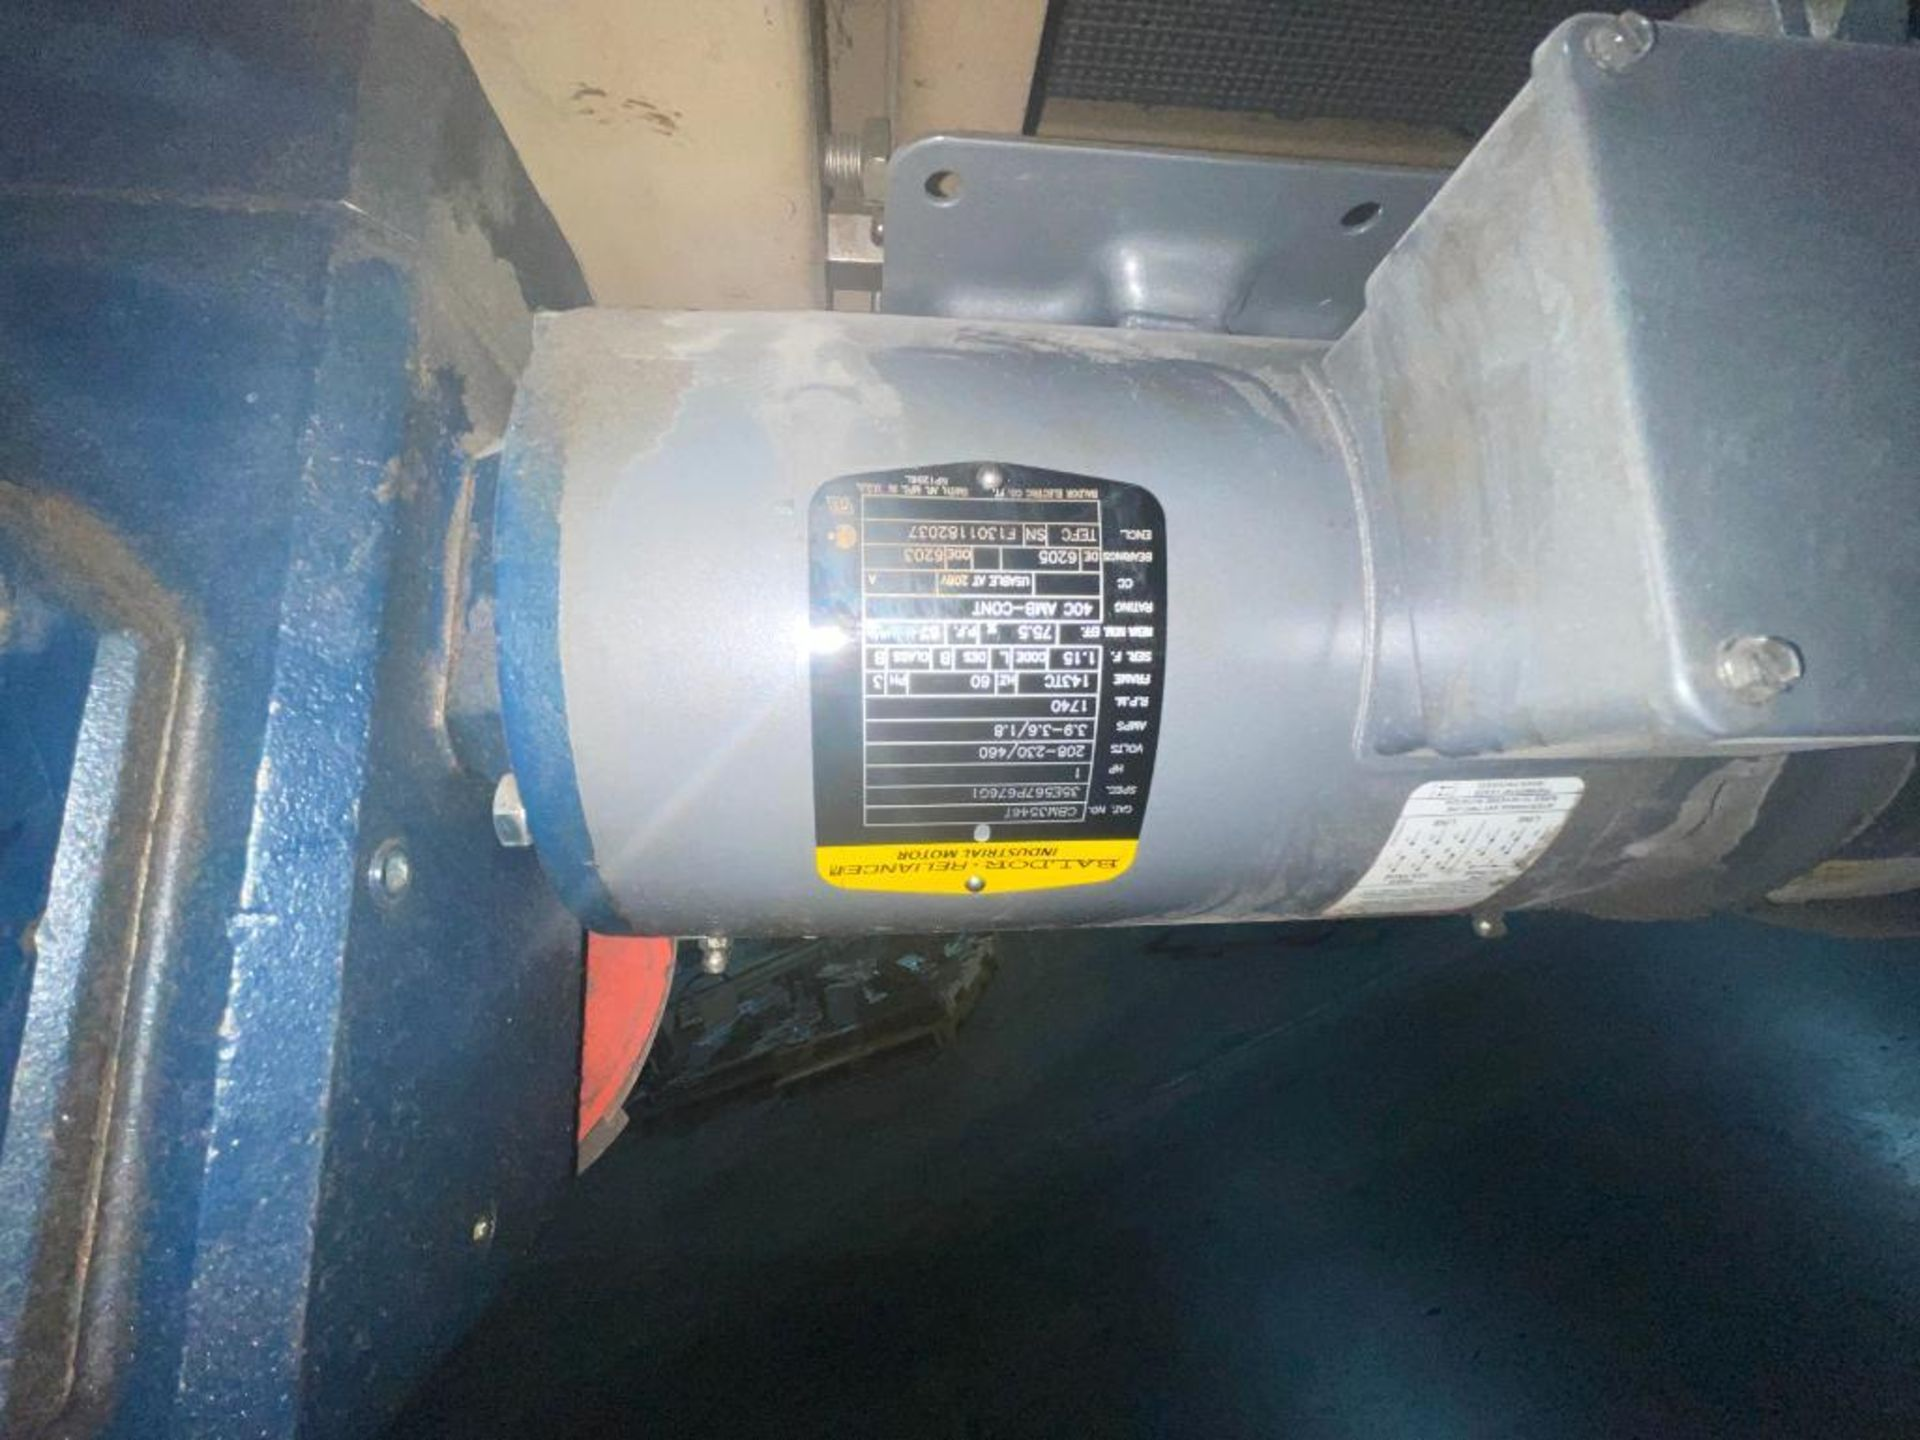 Mathews mild steel incline conveyor - Image 5 of 10